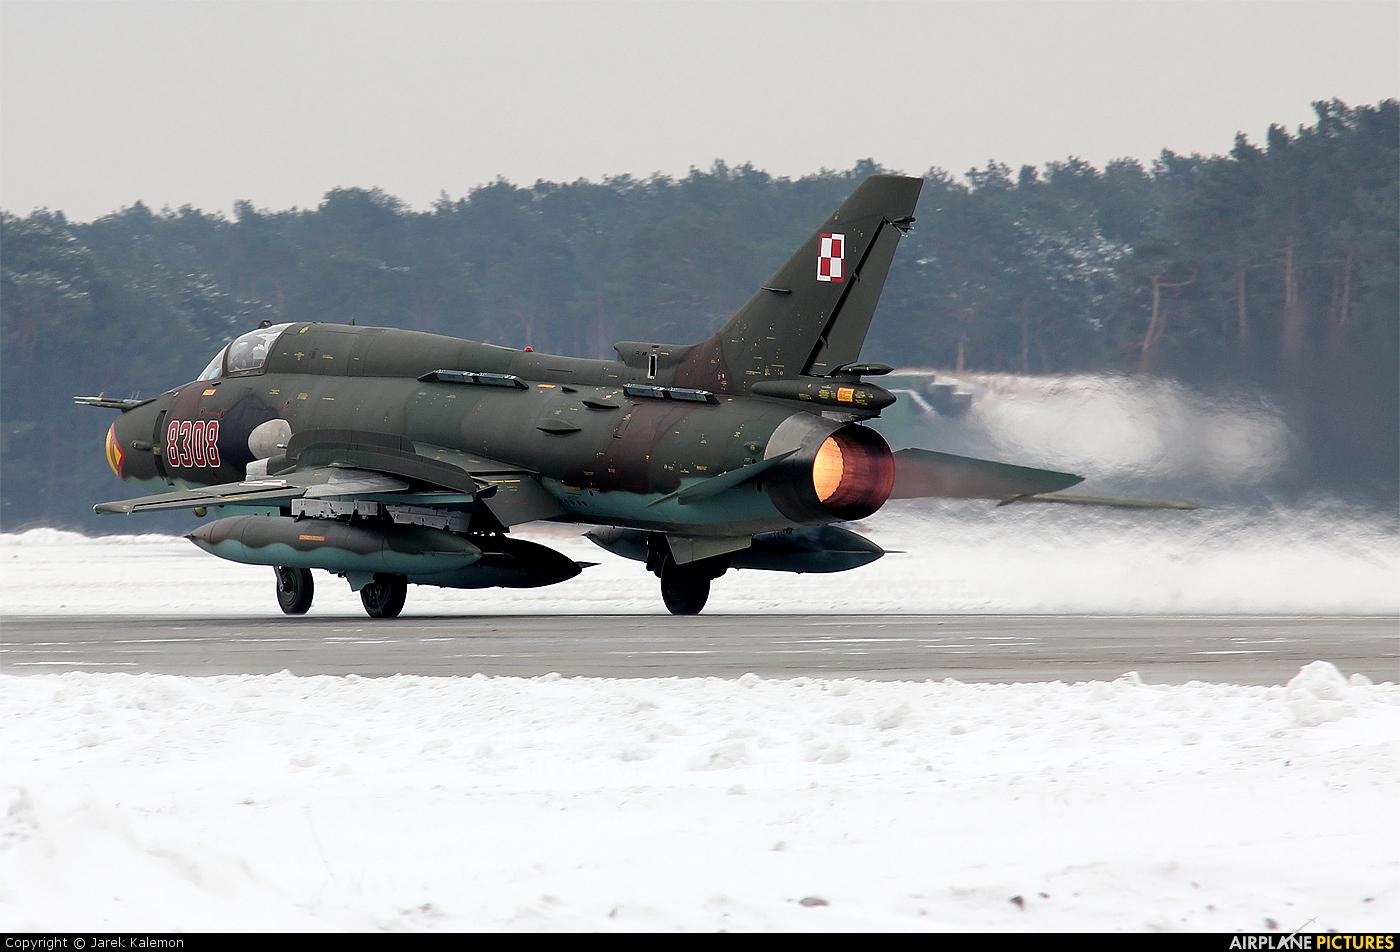 Poland - Air Force 8308 aircraft at Bydgoszcz - Szwederowo